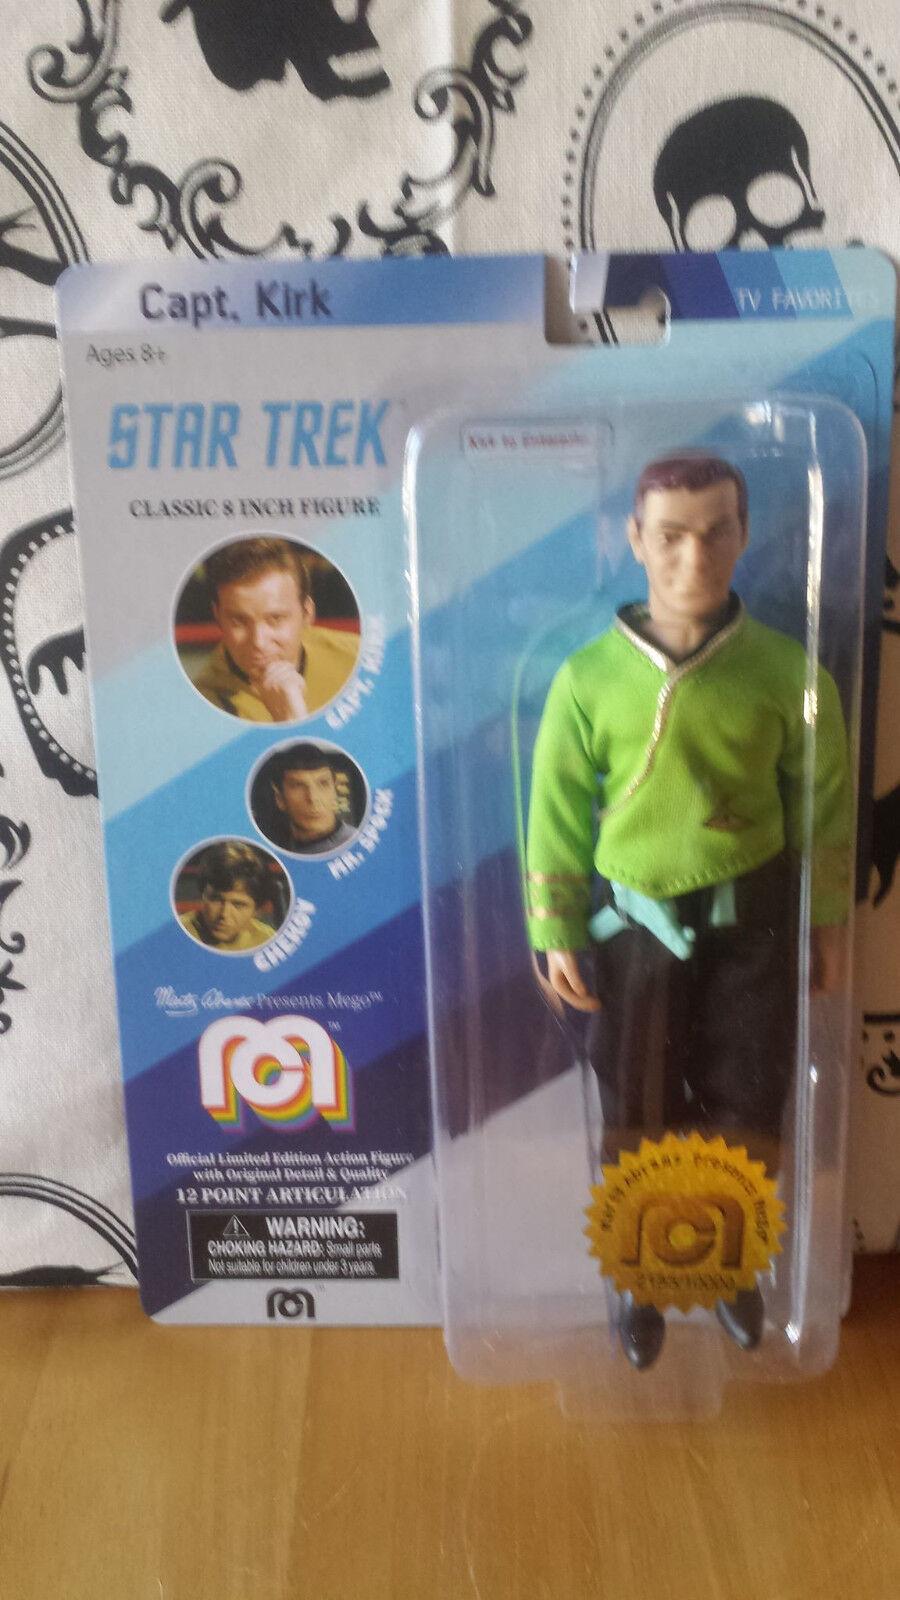 MEGO Star Trek Capt. Kirk Green Shirt 8  Action Figure